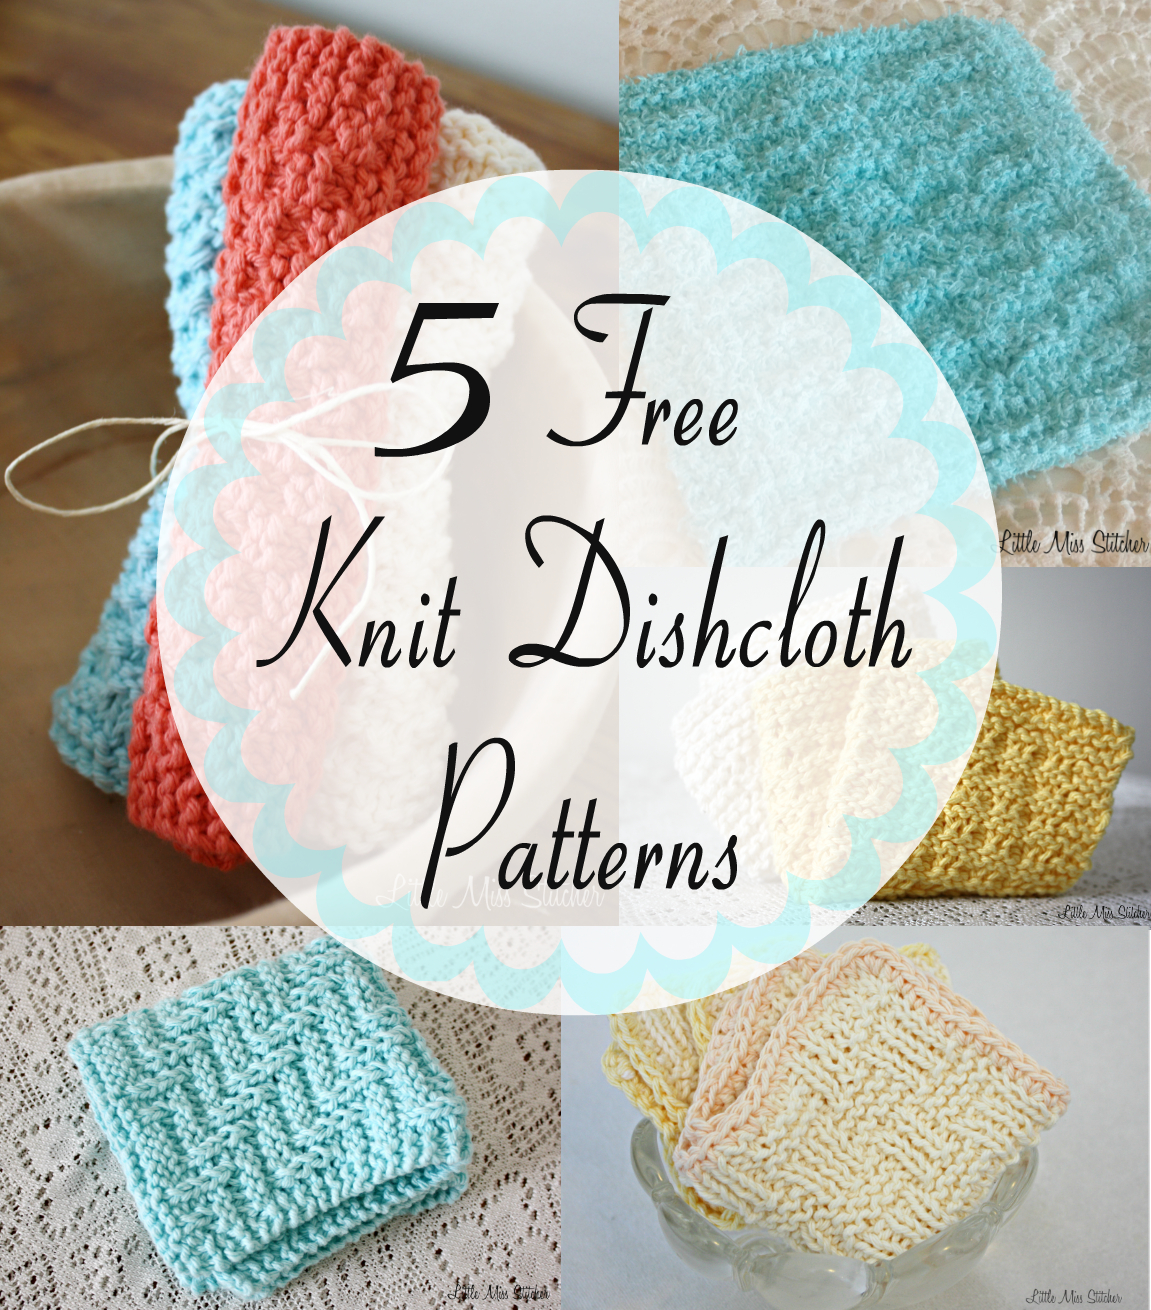 Washcloth Knitting Pattern Little Miss Stitcher 5 Free Knit Dishcloth Patterns